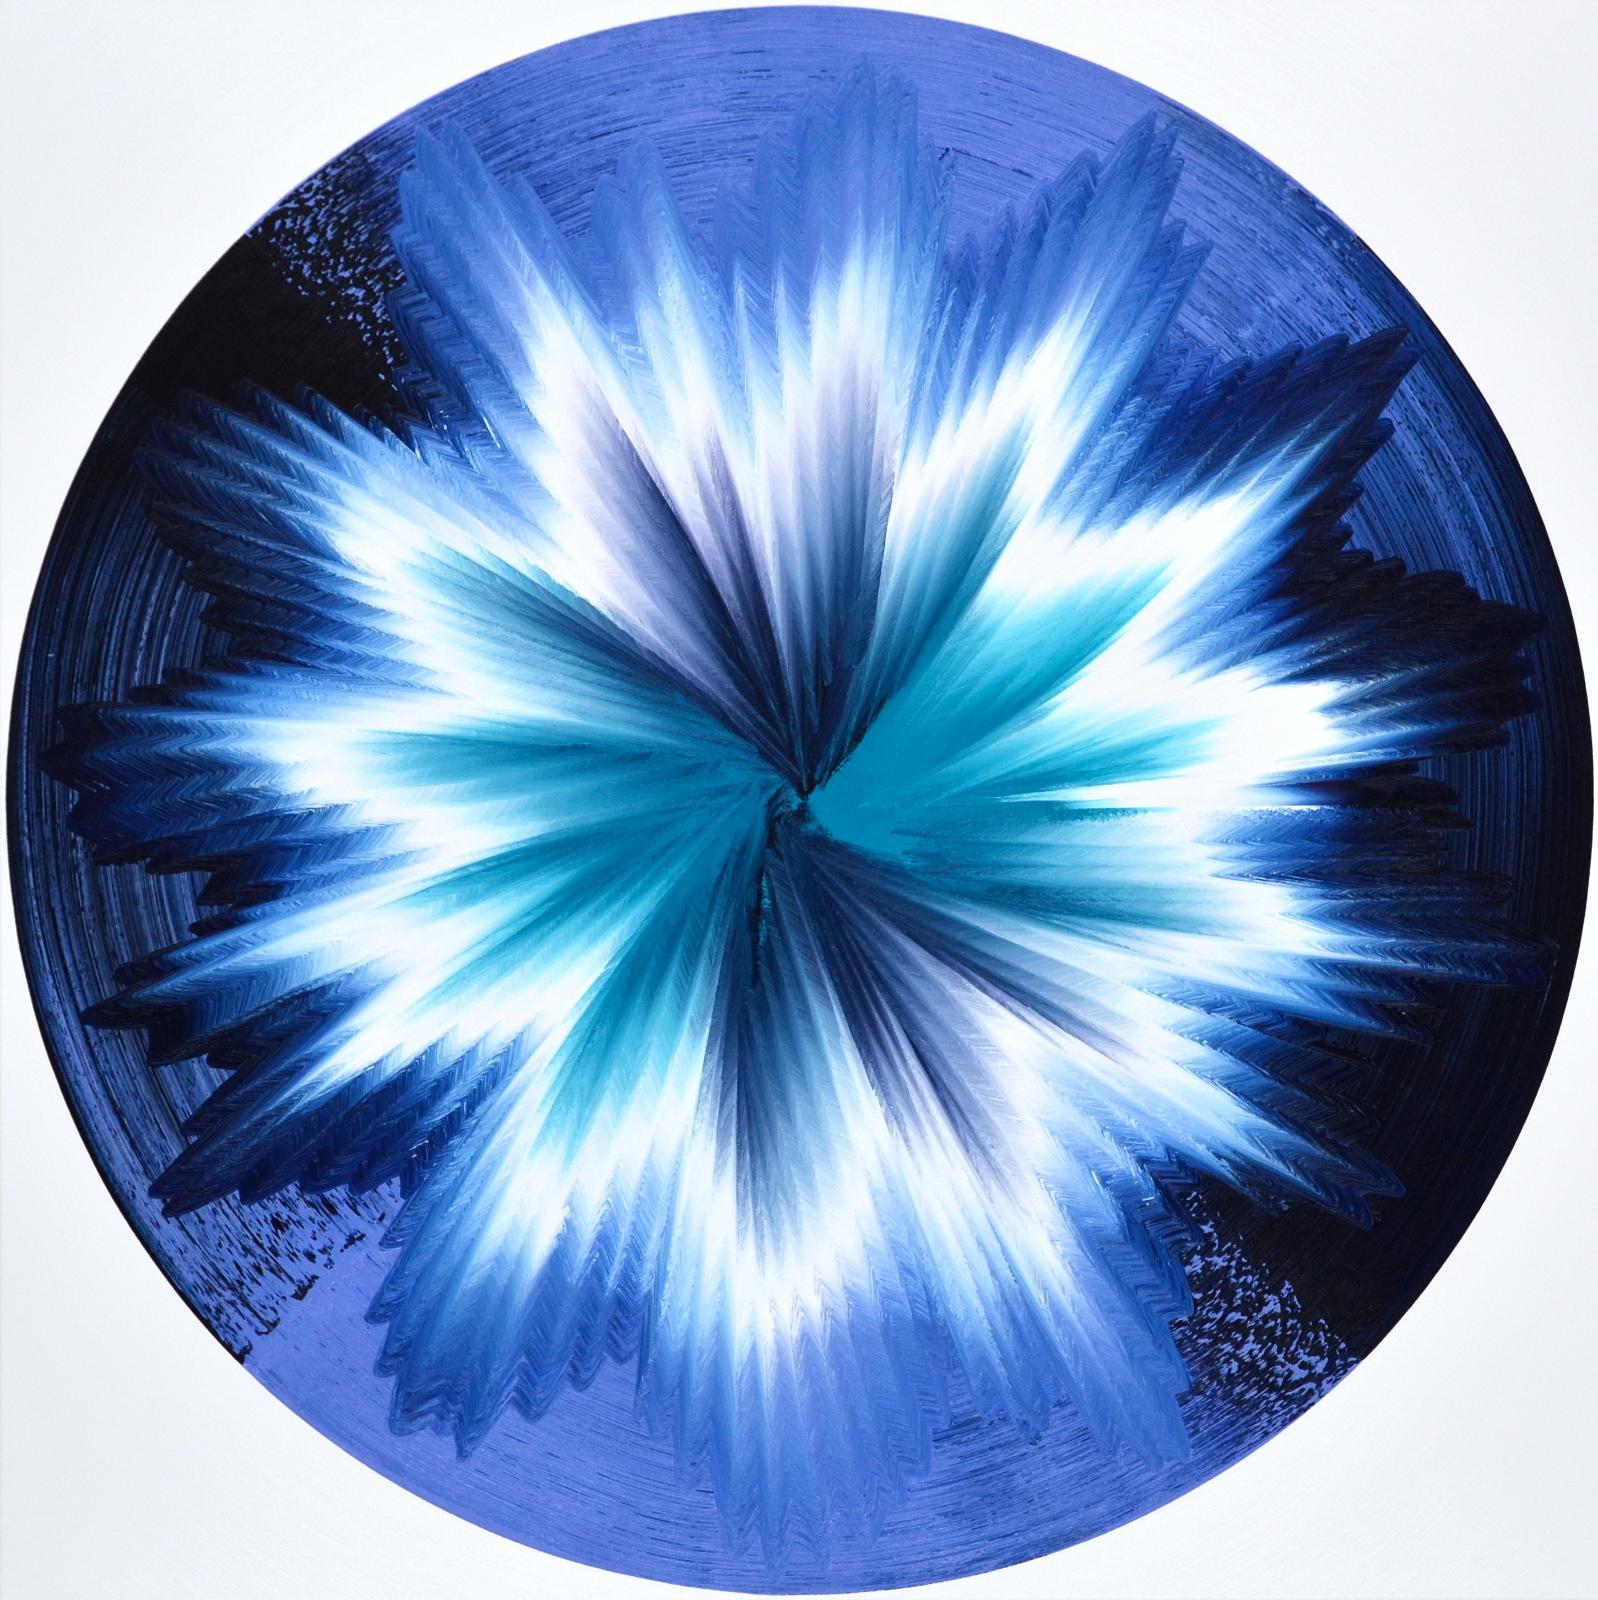 Vera Leutloff Circular Oszillation: Fjord 2020 Öl auf Leinwand 120 cm x 120 cm Preis auf Anfrage, lev001de